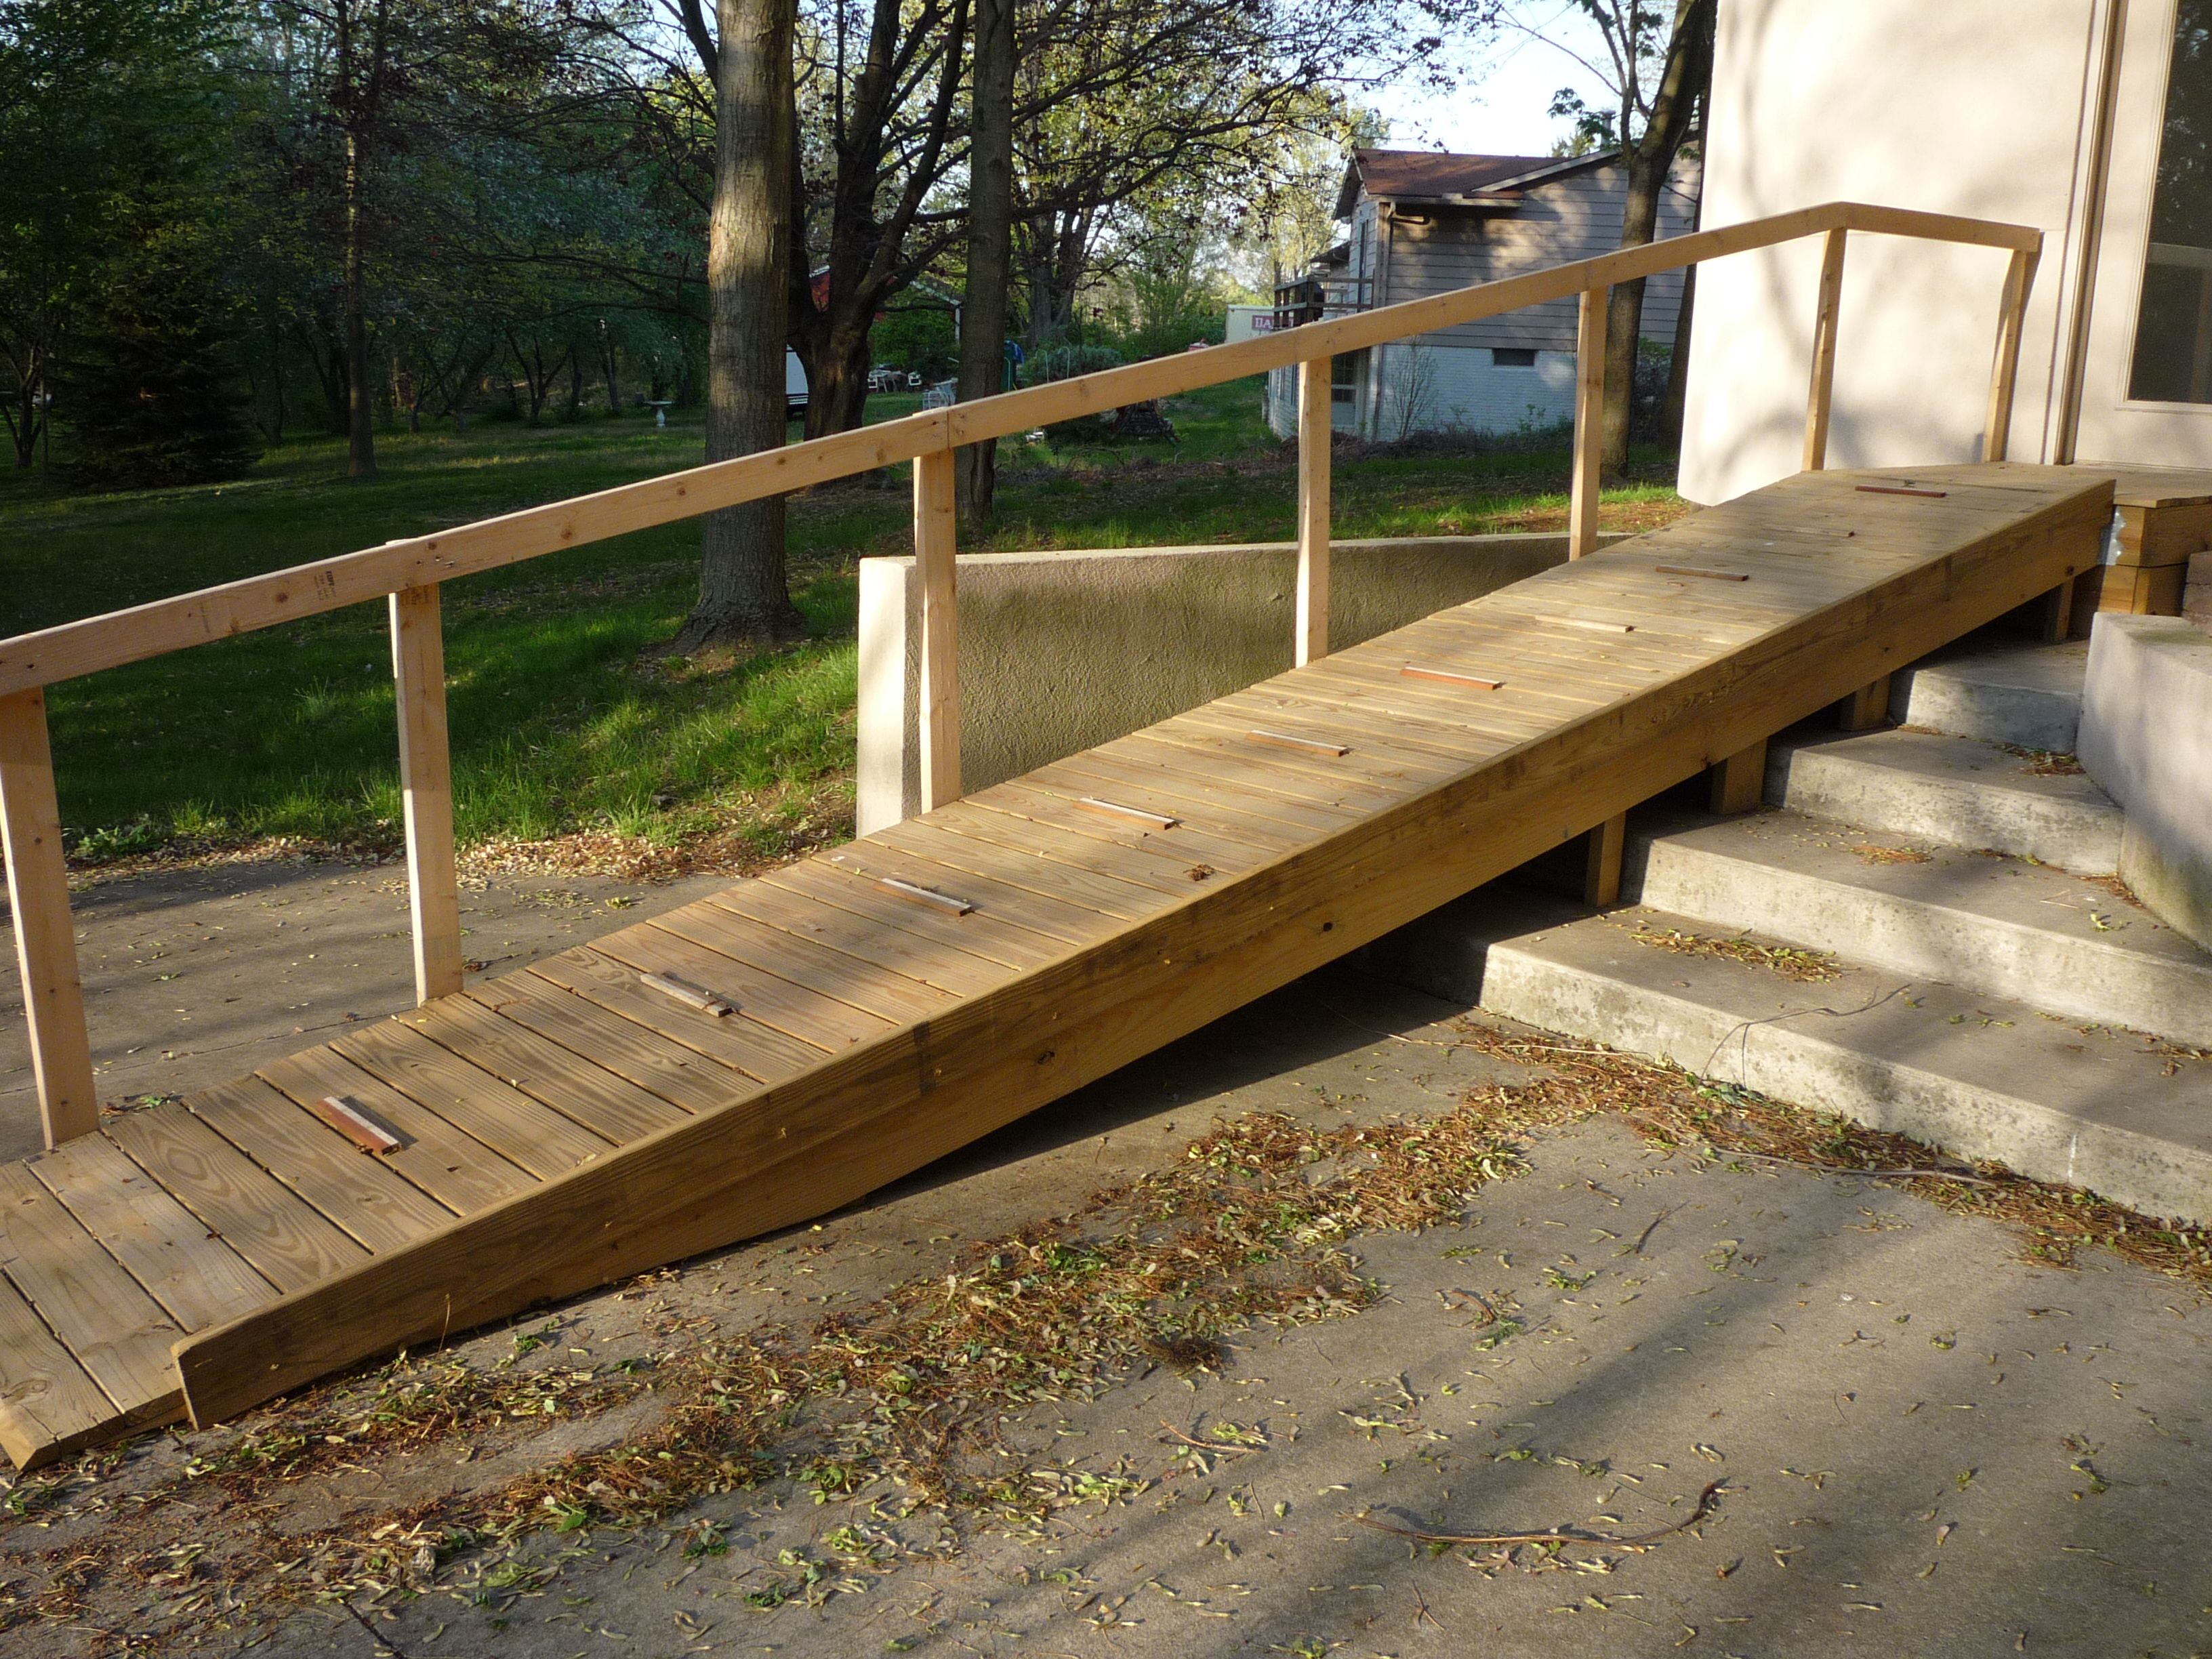 free wheelchair ramp plans  Wooden Wheelchair Ramp Plans